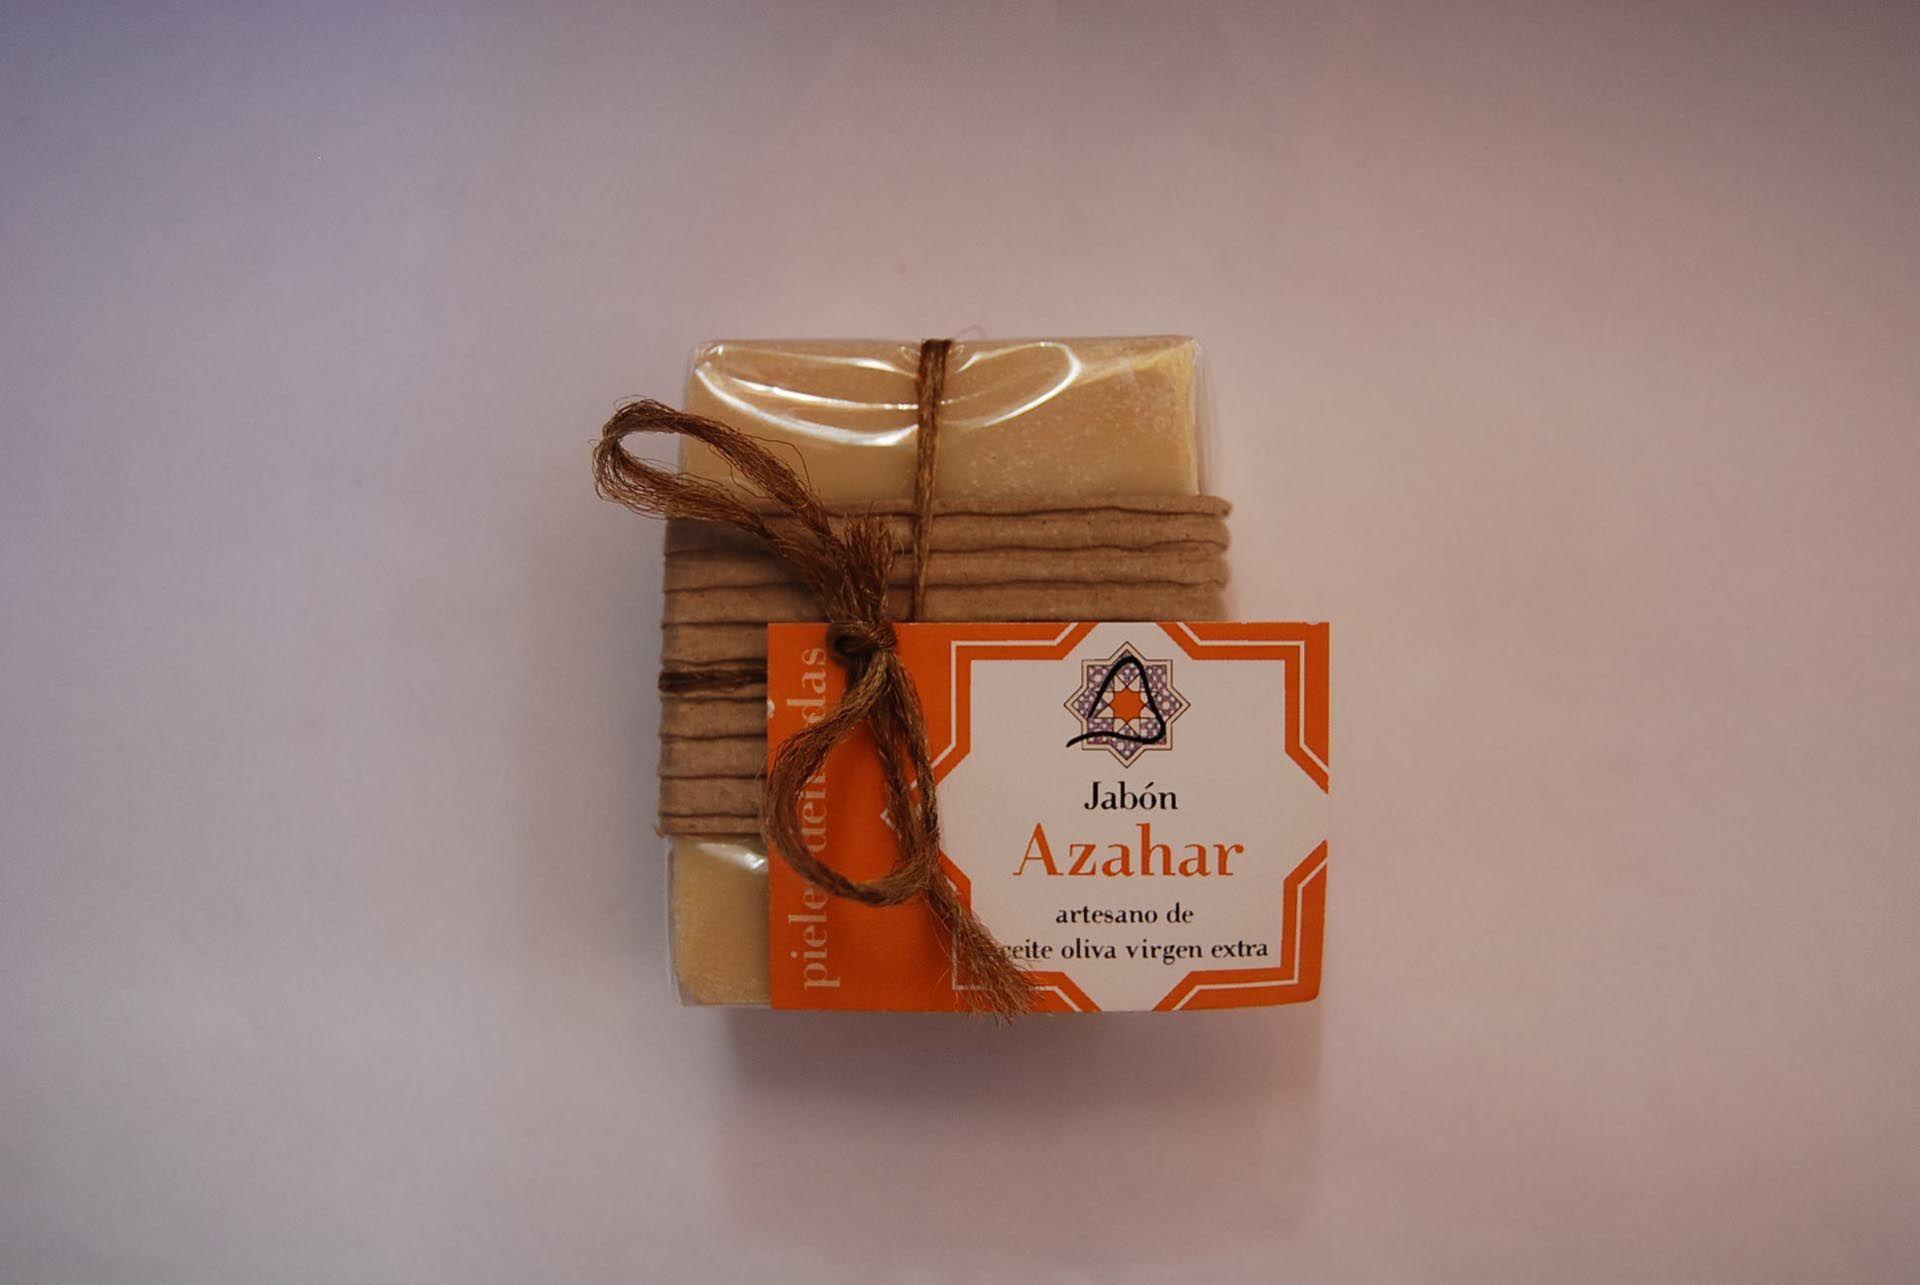 Jabón artesano de azahar: Productos de Arahí